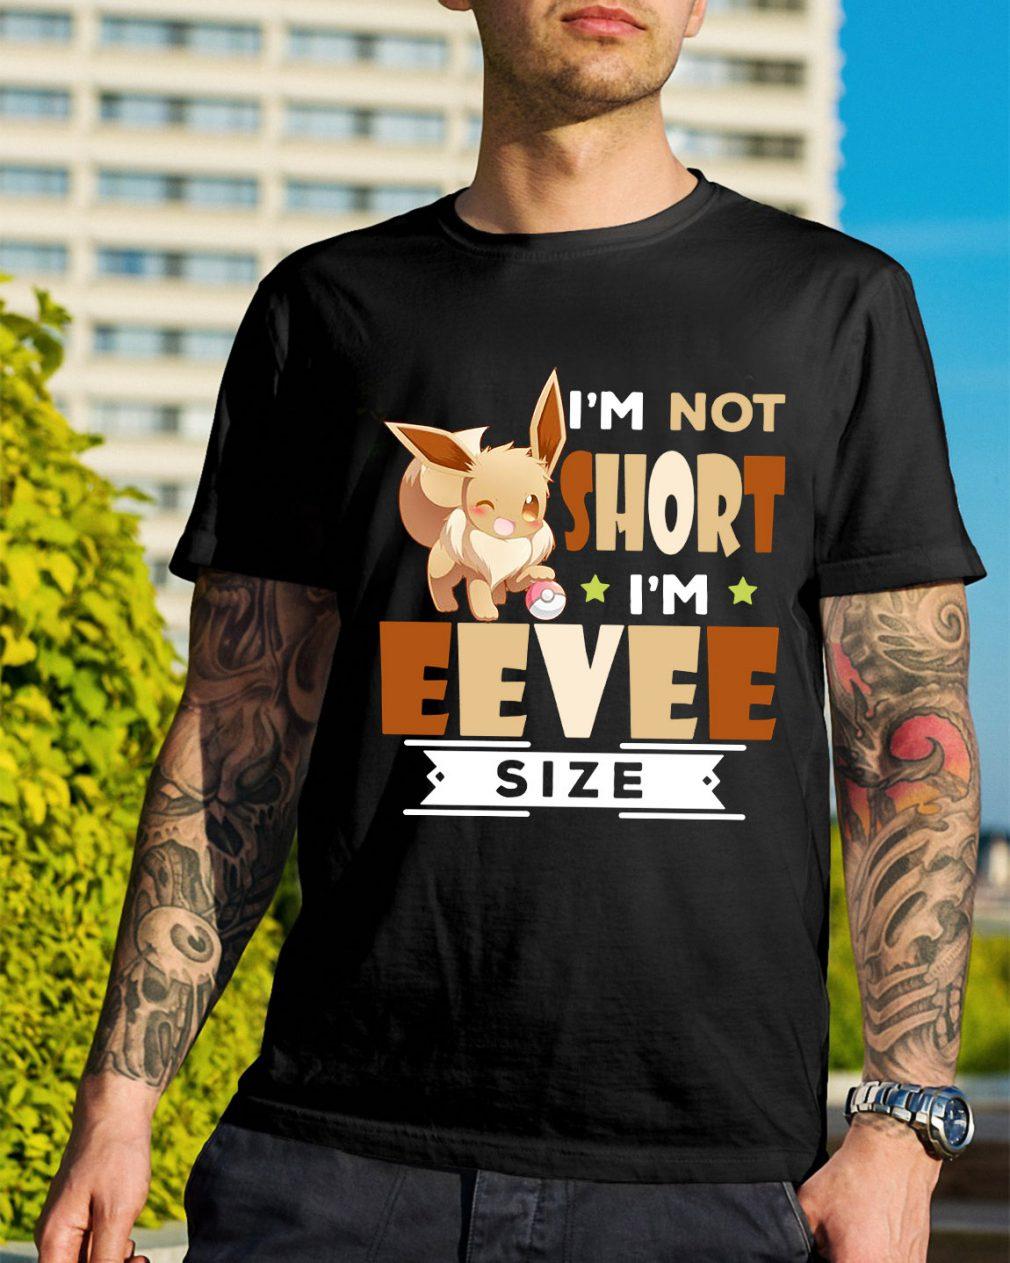 Eevee Pokemon I'm not short I'm Eevee size shirt